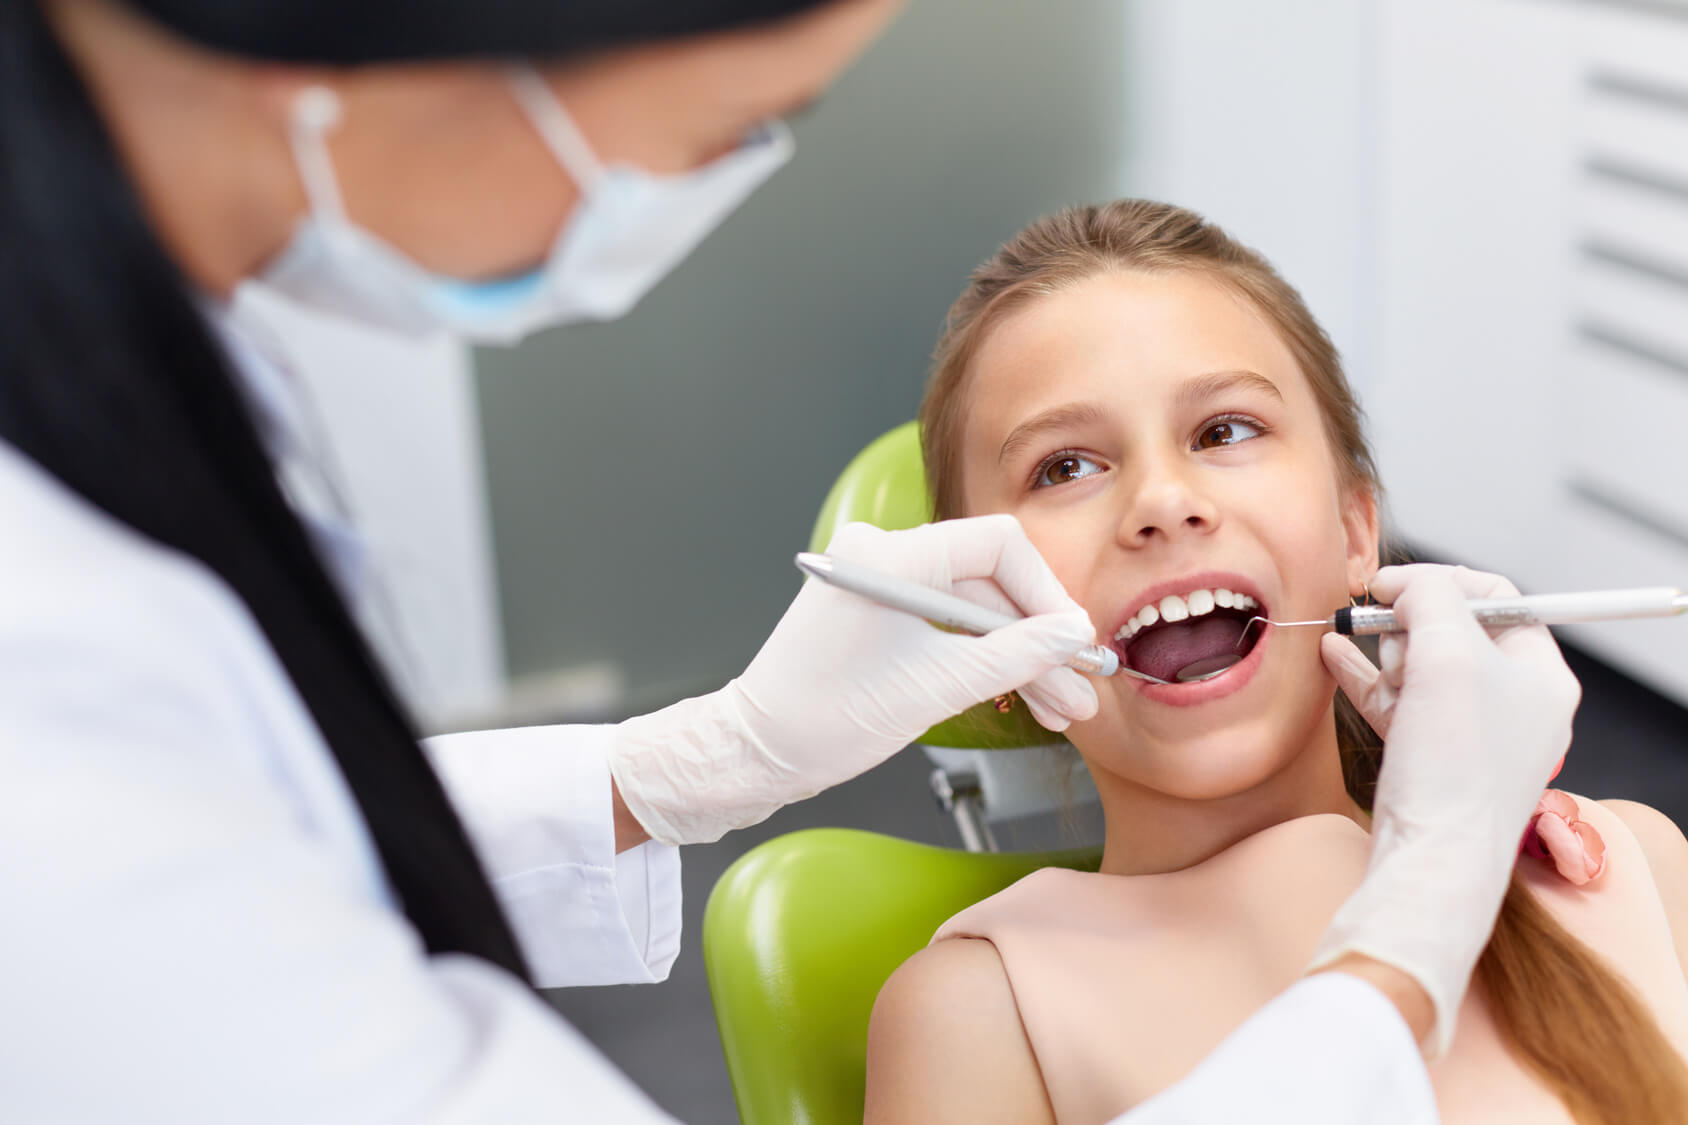 Child having a dental check-up